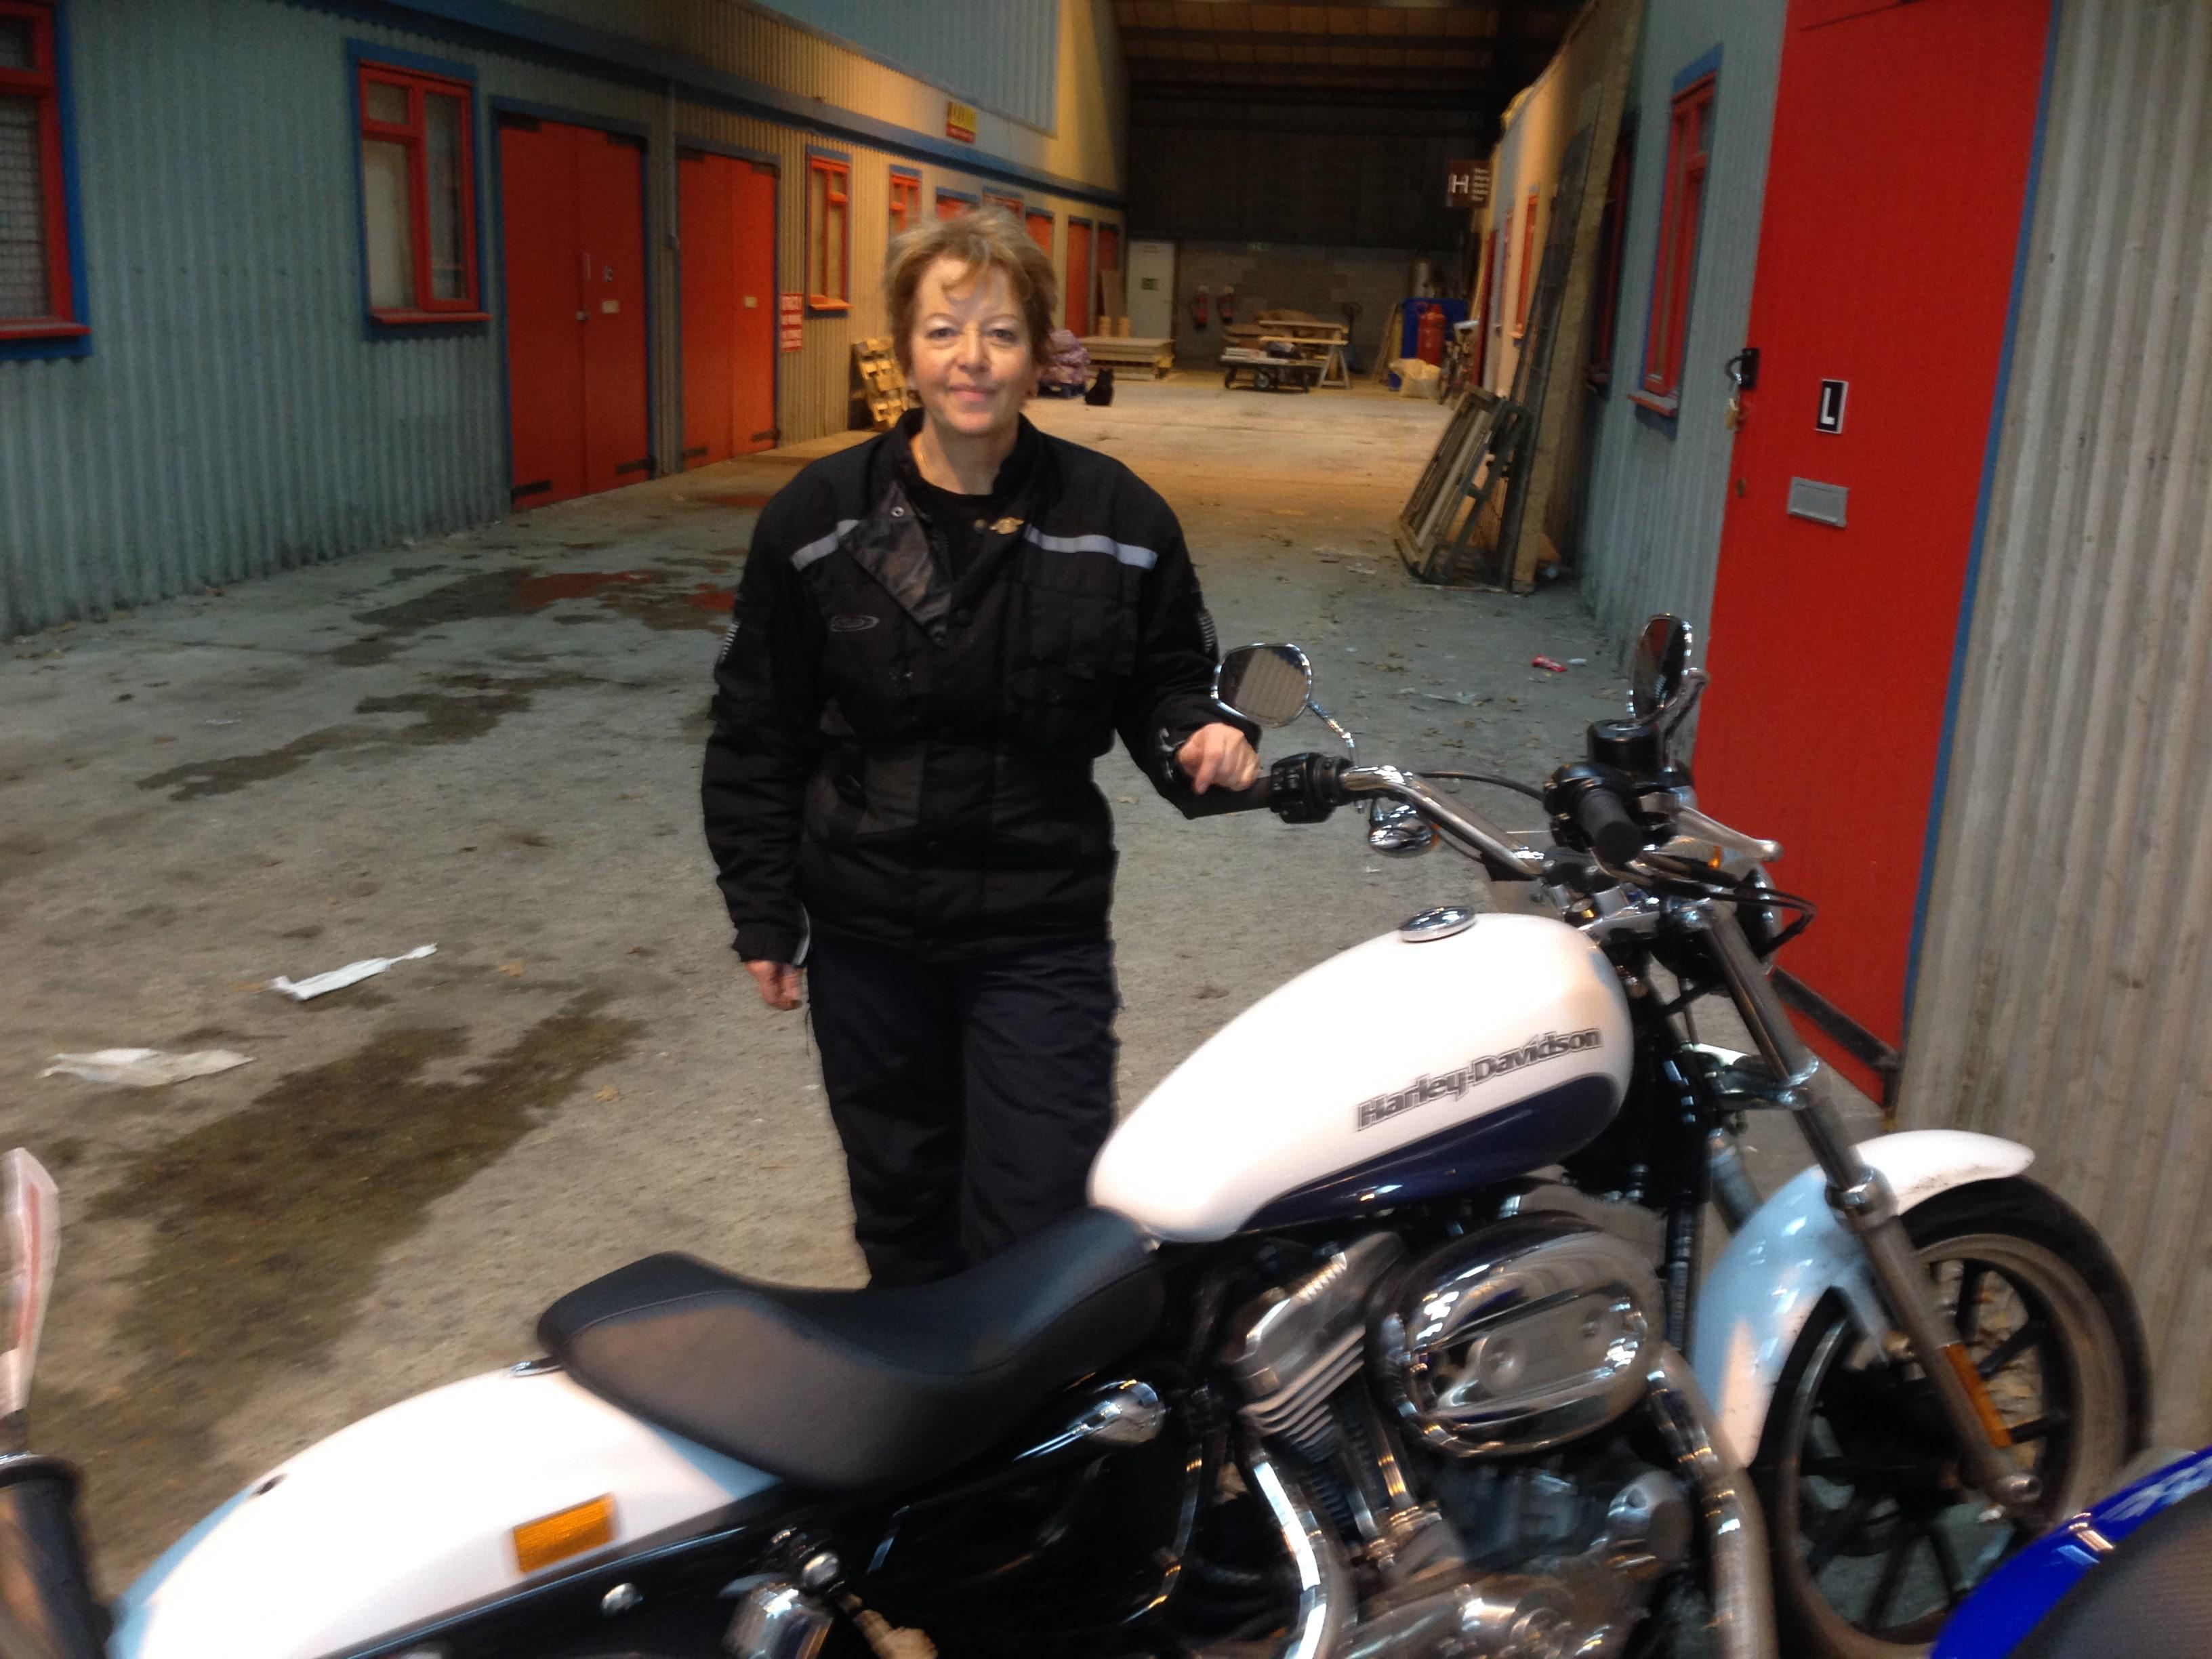 DAS on a Harley Davidson!